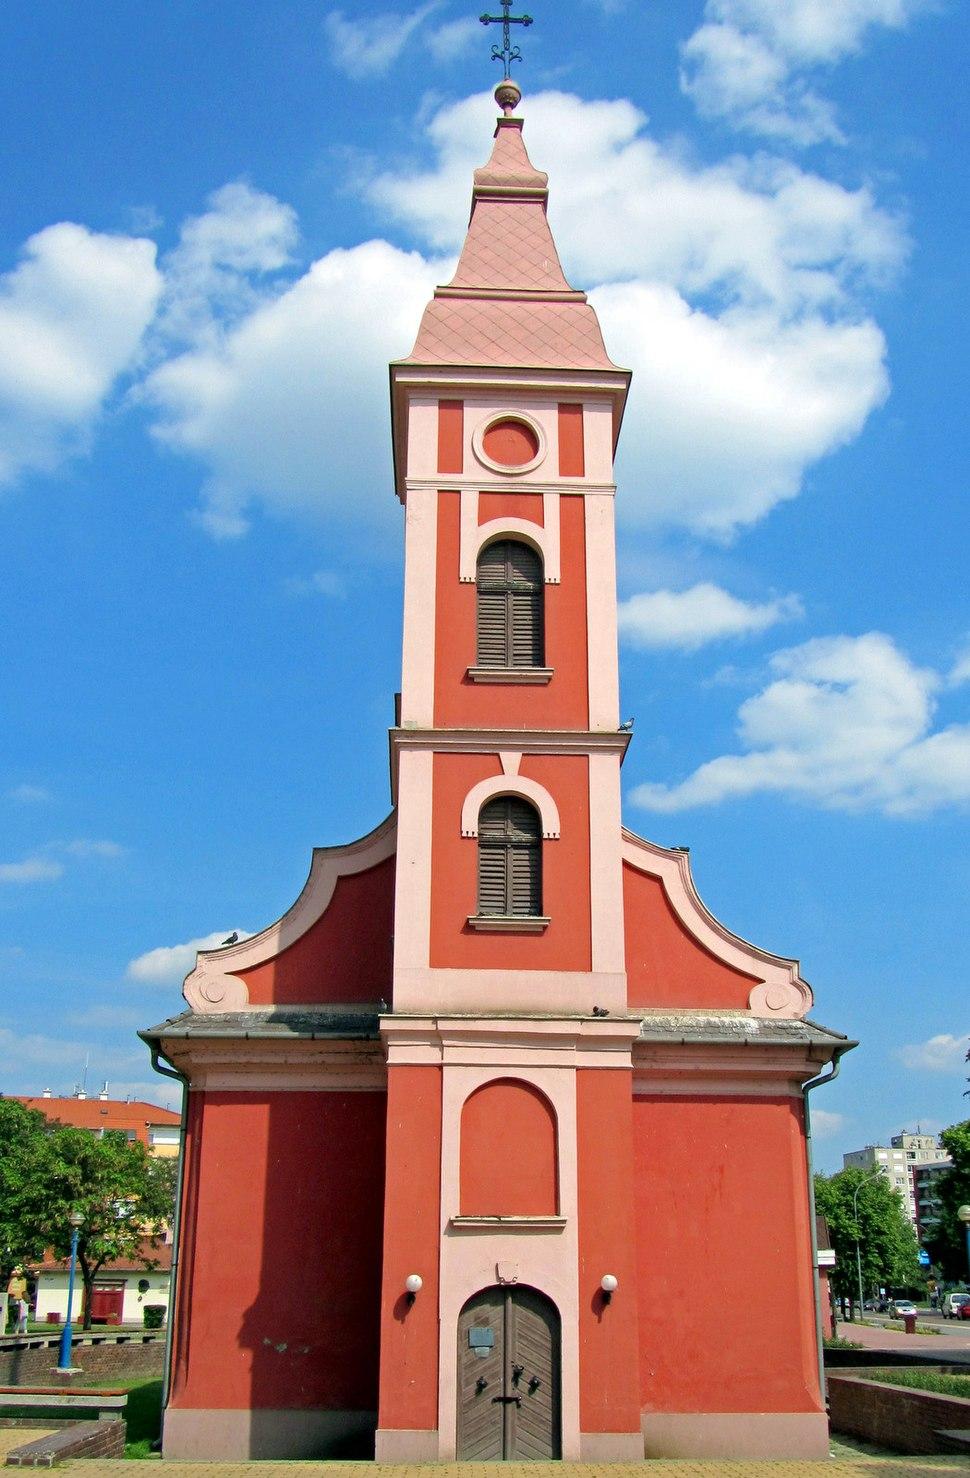 Magyar ortodox templom (3539. számú műemlék)